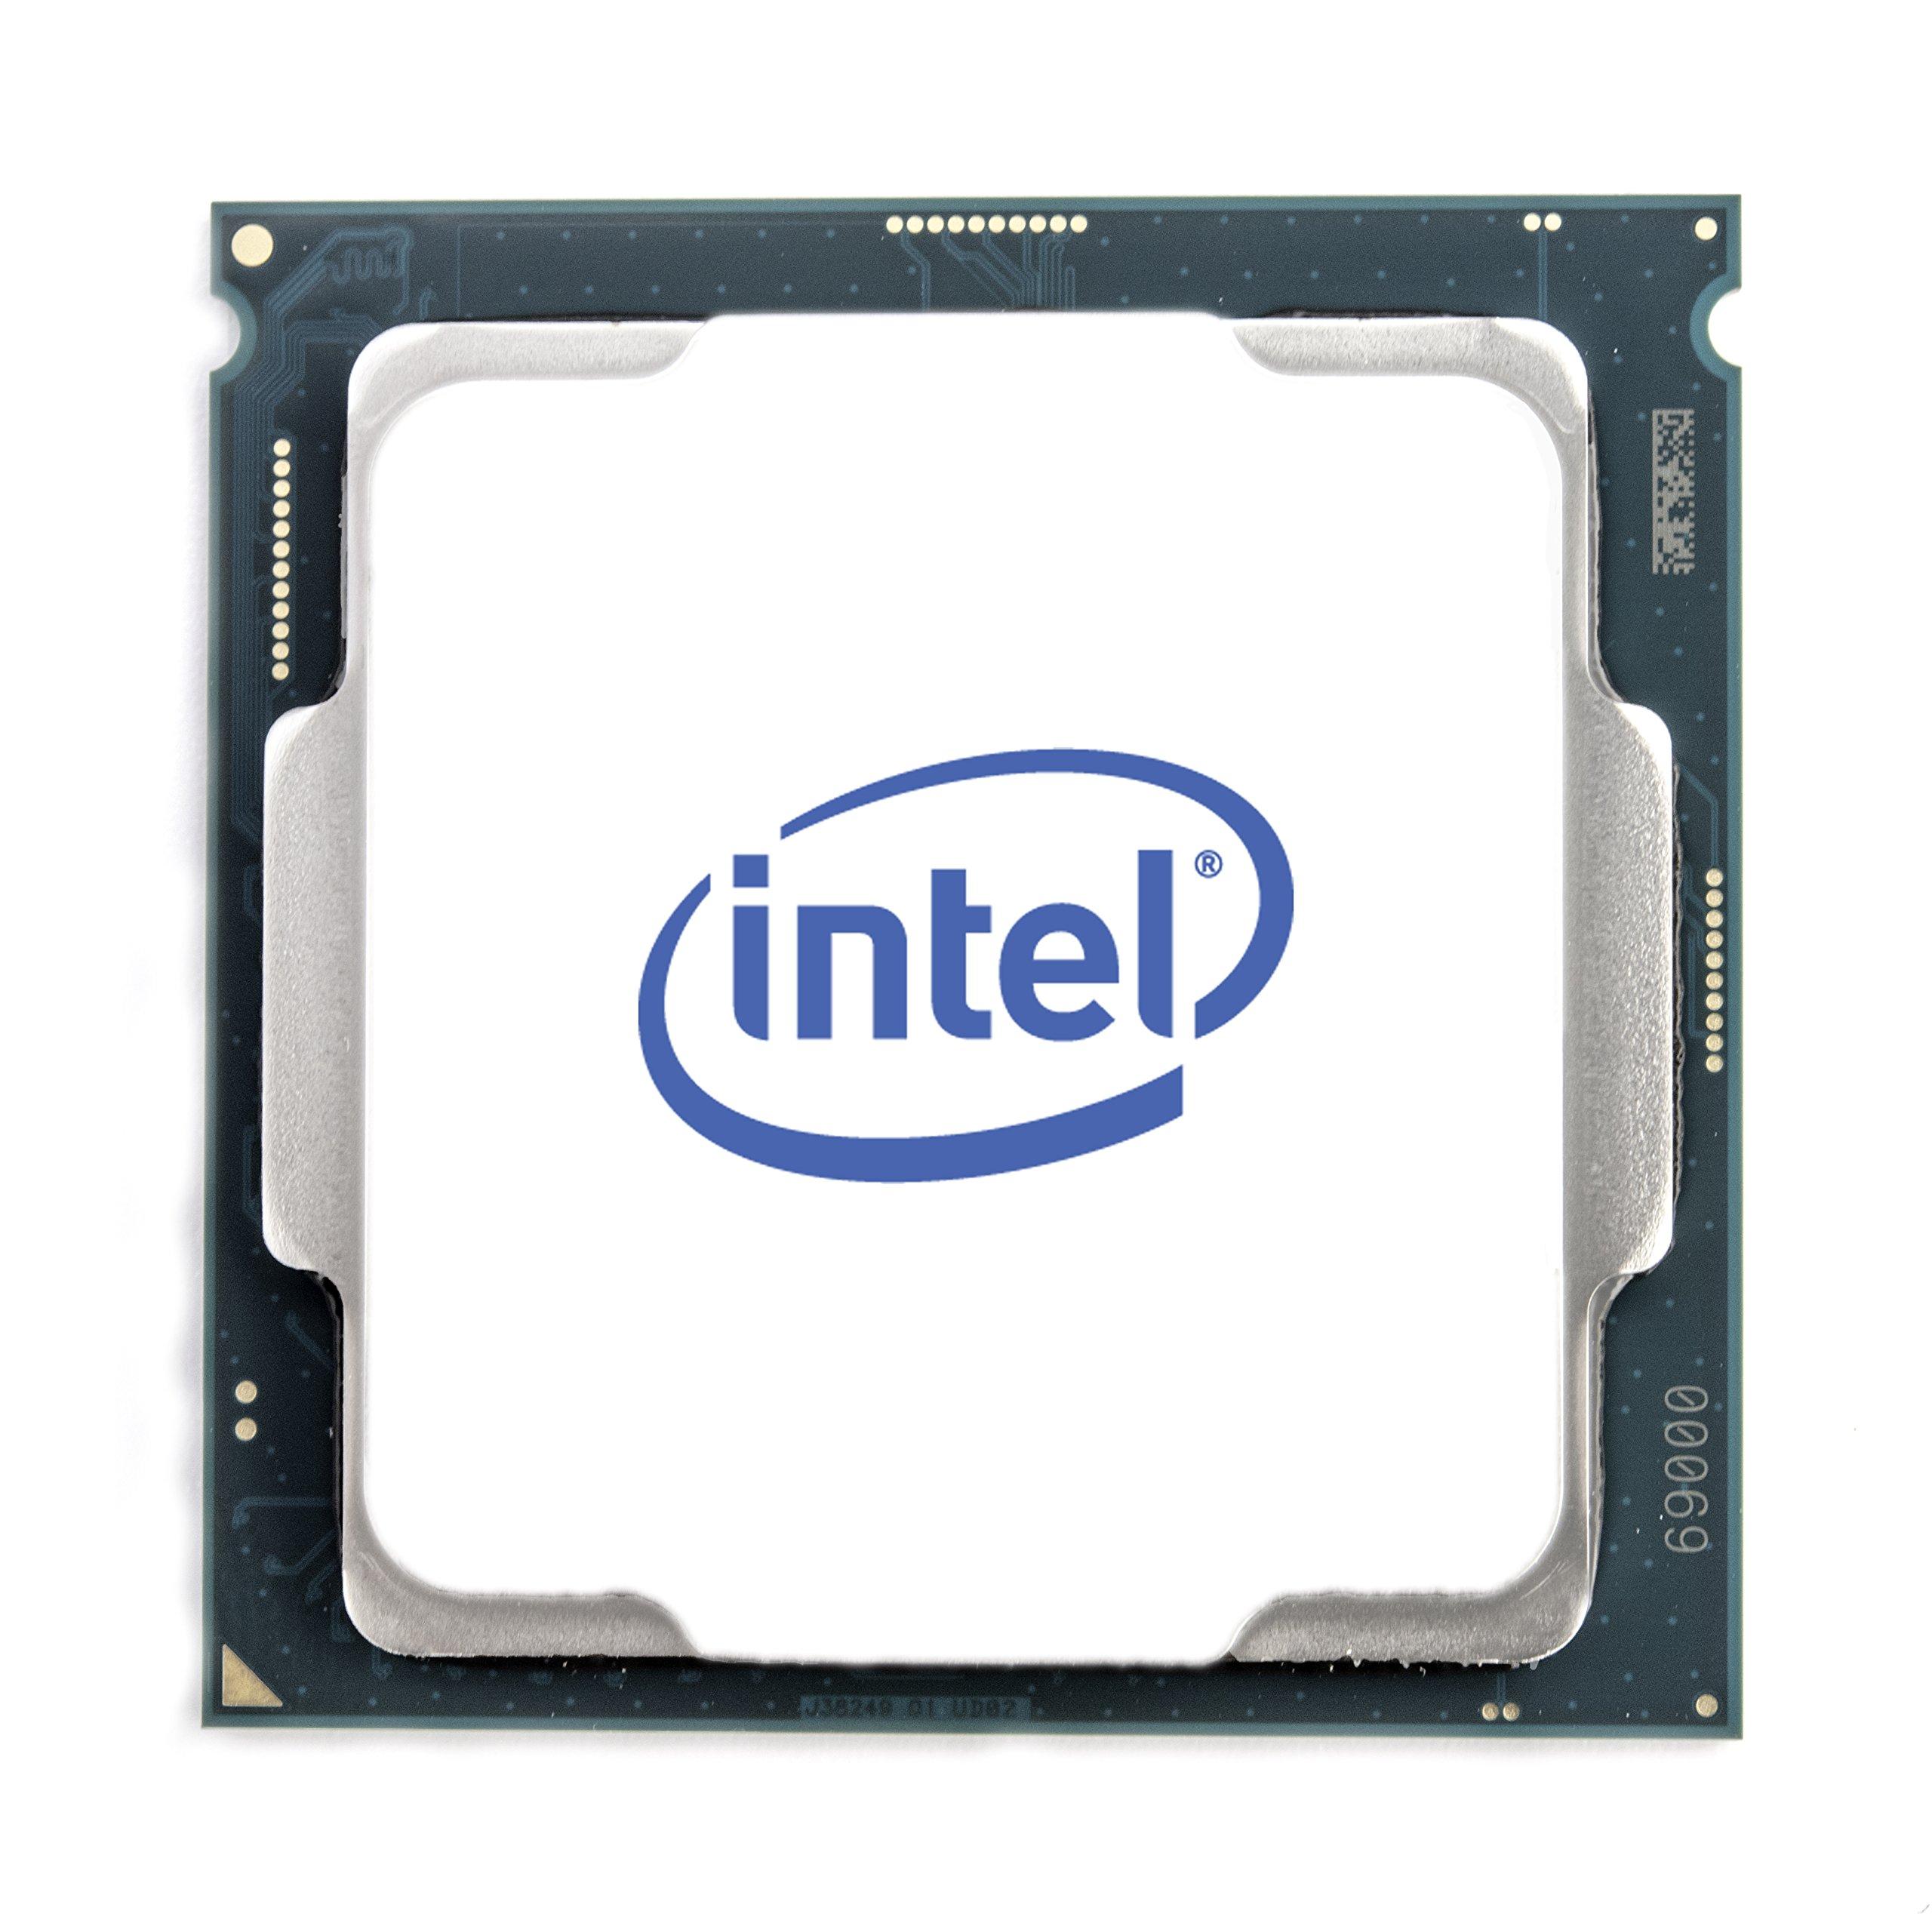 Intel Core i7-8700 Desktop Processor 6 Cores up to 4.6 GHz LGA 1151 300 Series 65W by Intel (Image #1)